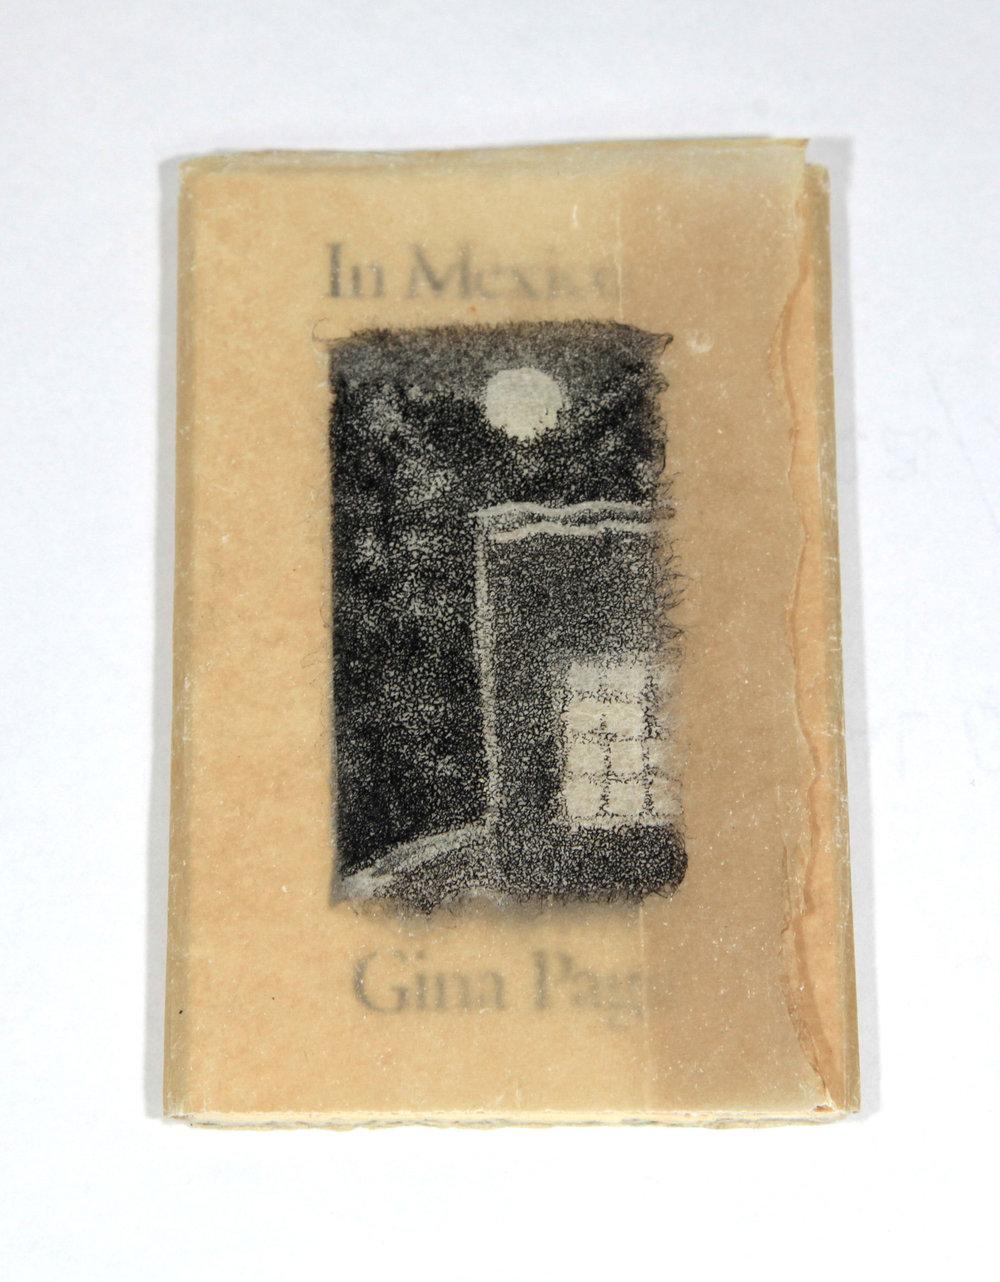 Gina Page, In Mexico, Chine colle aquatints, stenciled art, 2011, $125, Richmond, British Columbia, Canada